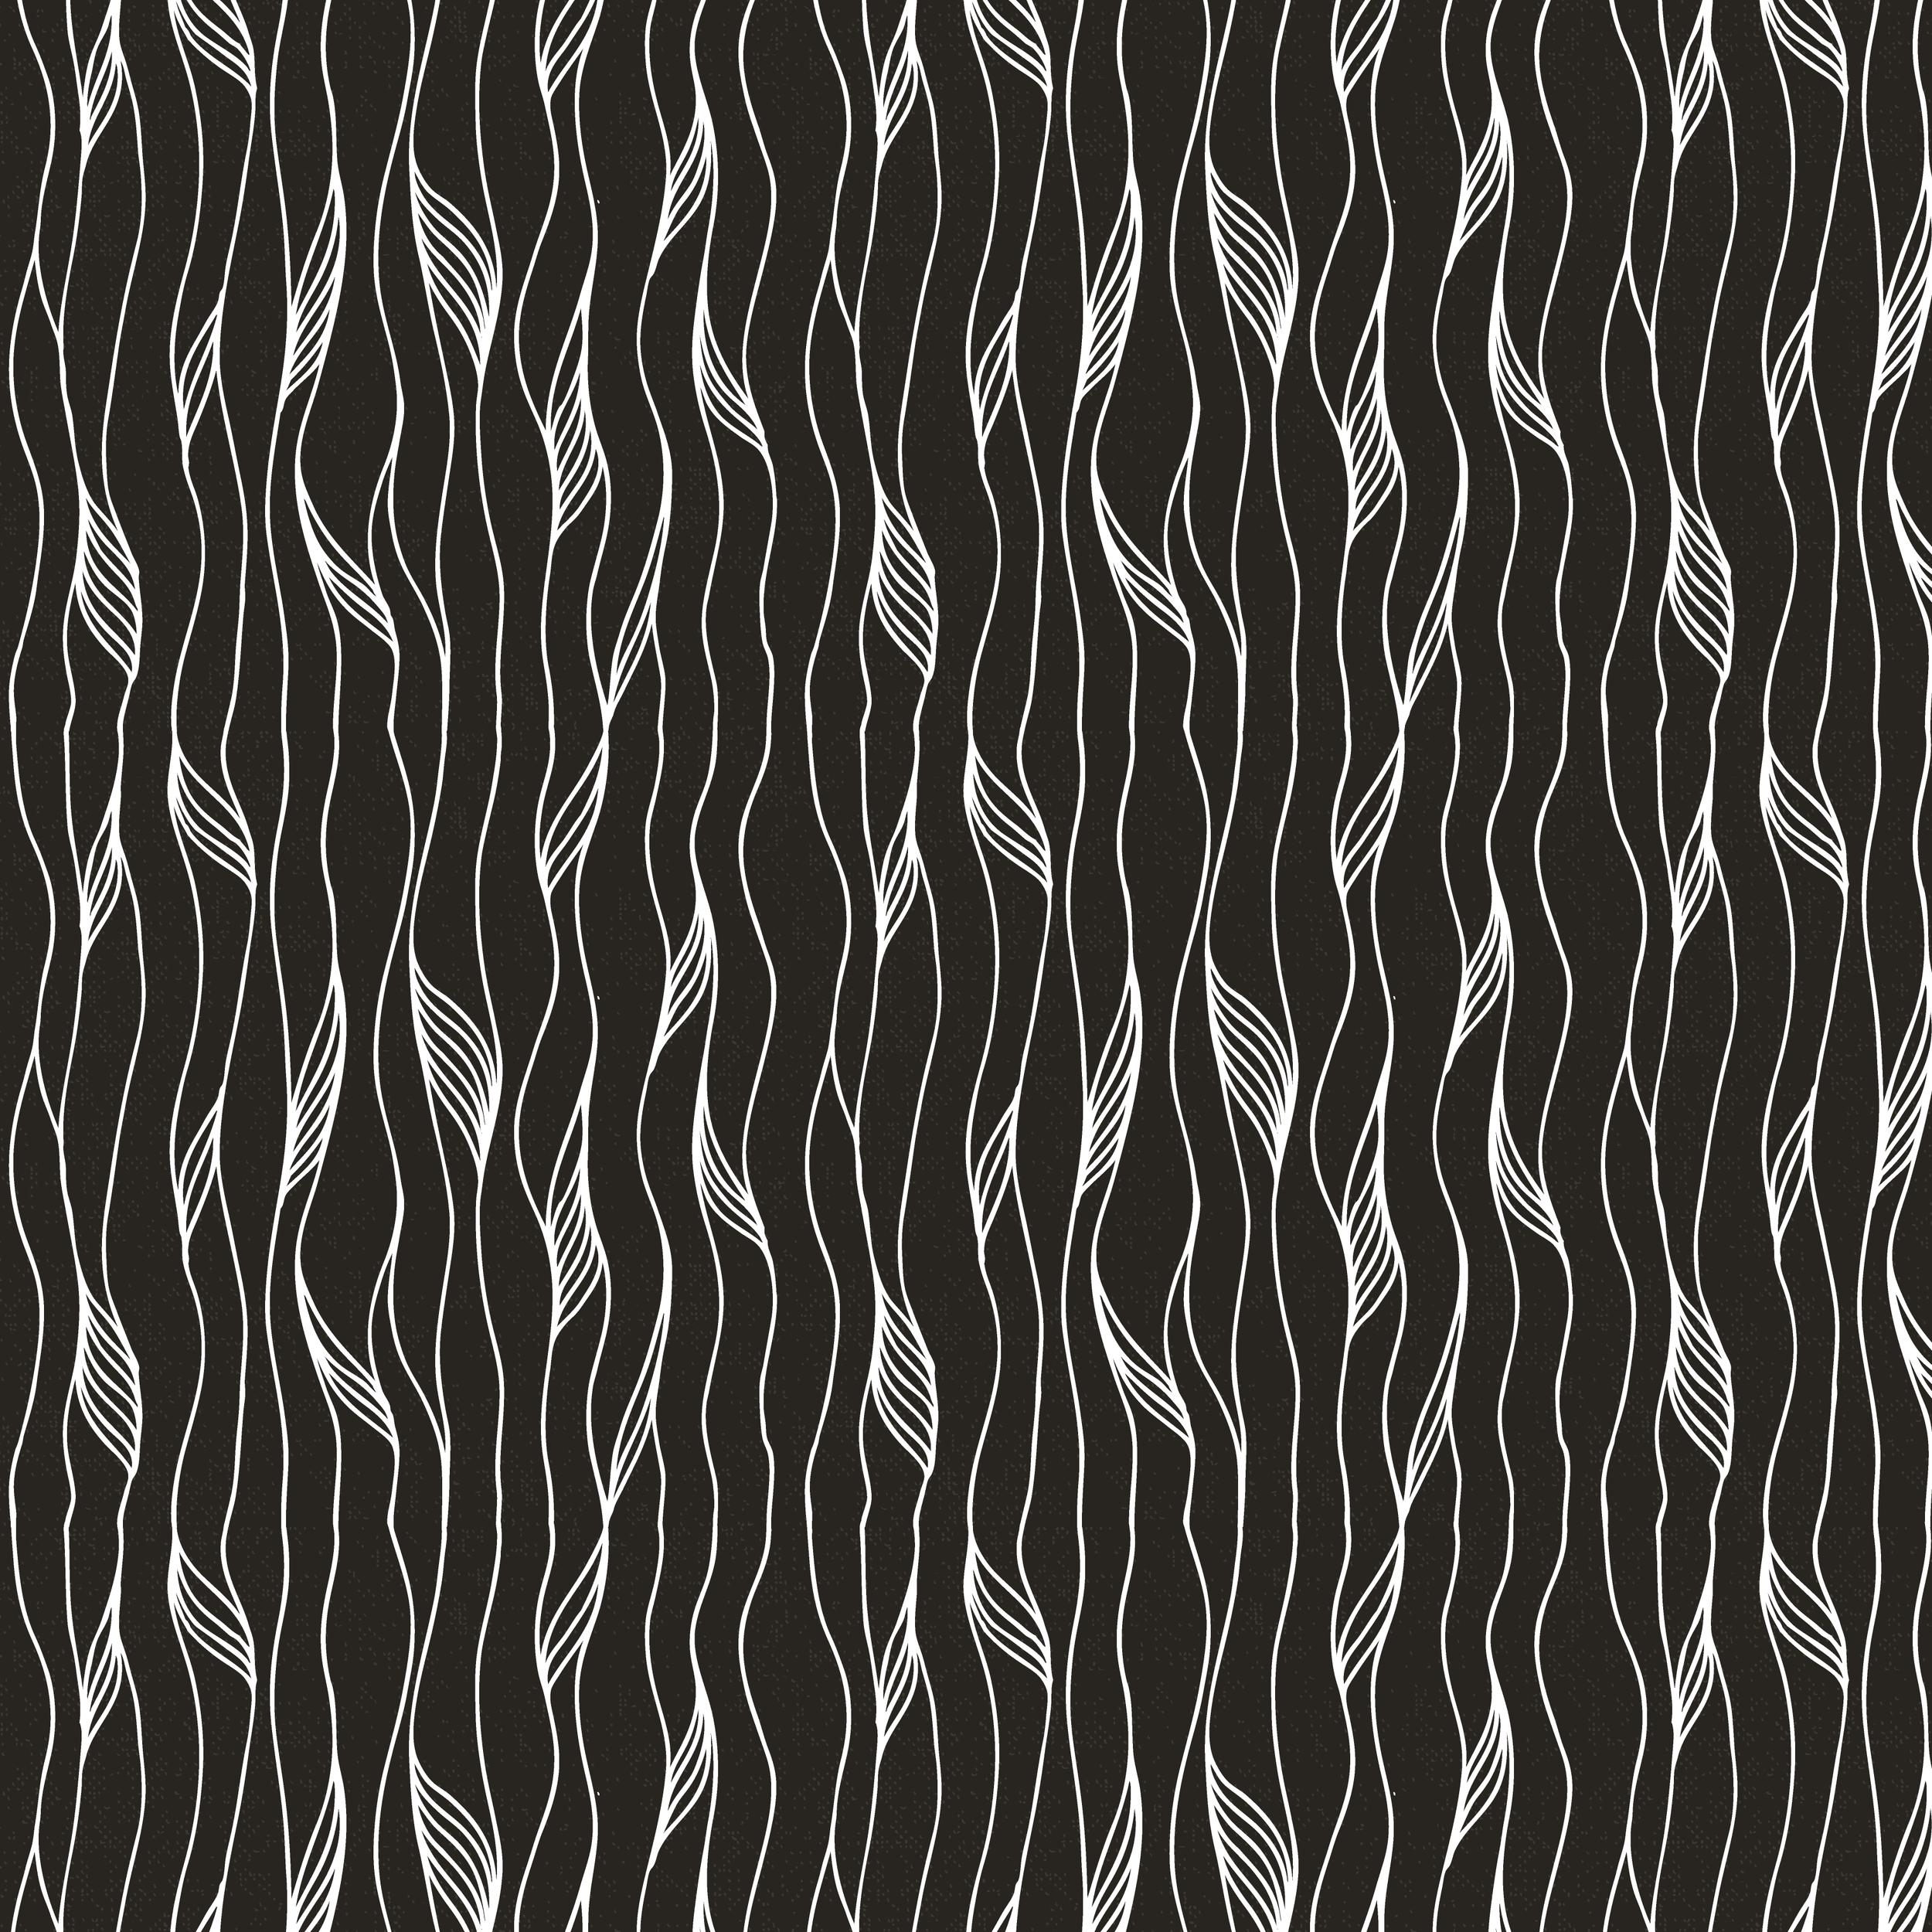 LWLP Patterns_Lines_Dune_PNG.png